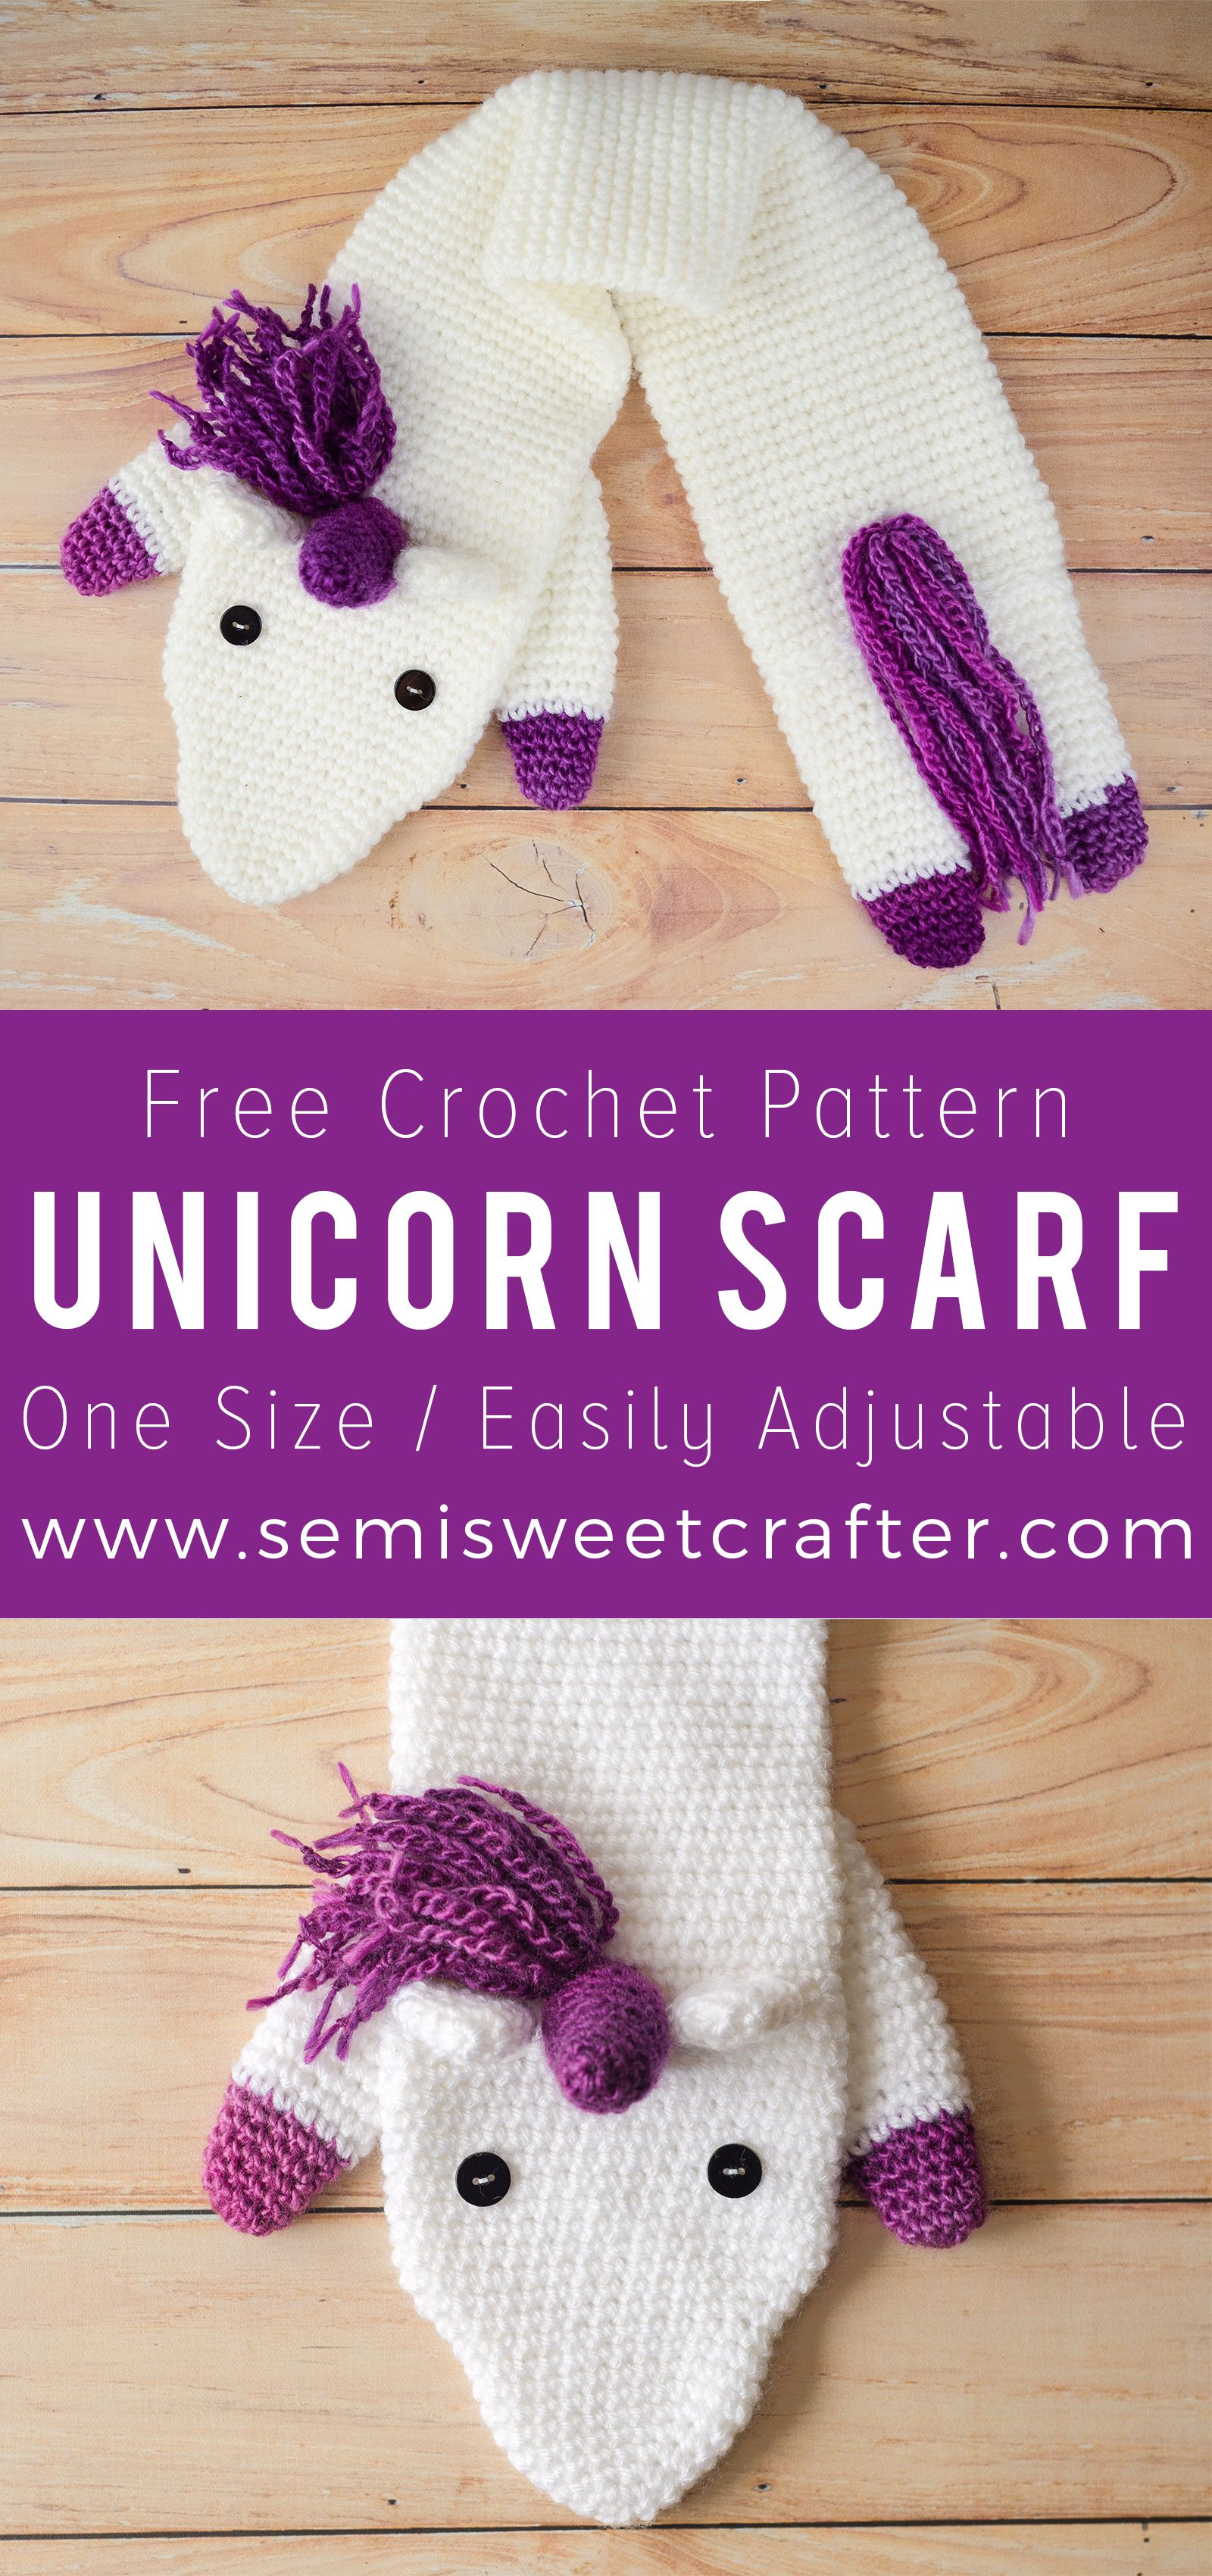 Unicorn Scarf | Accesorios